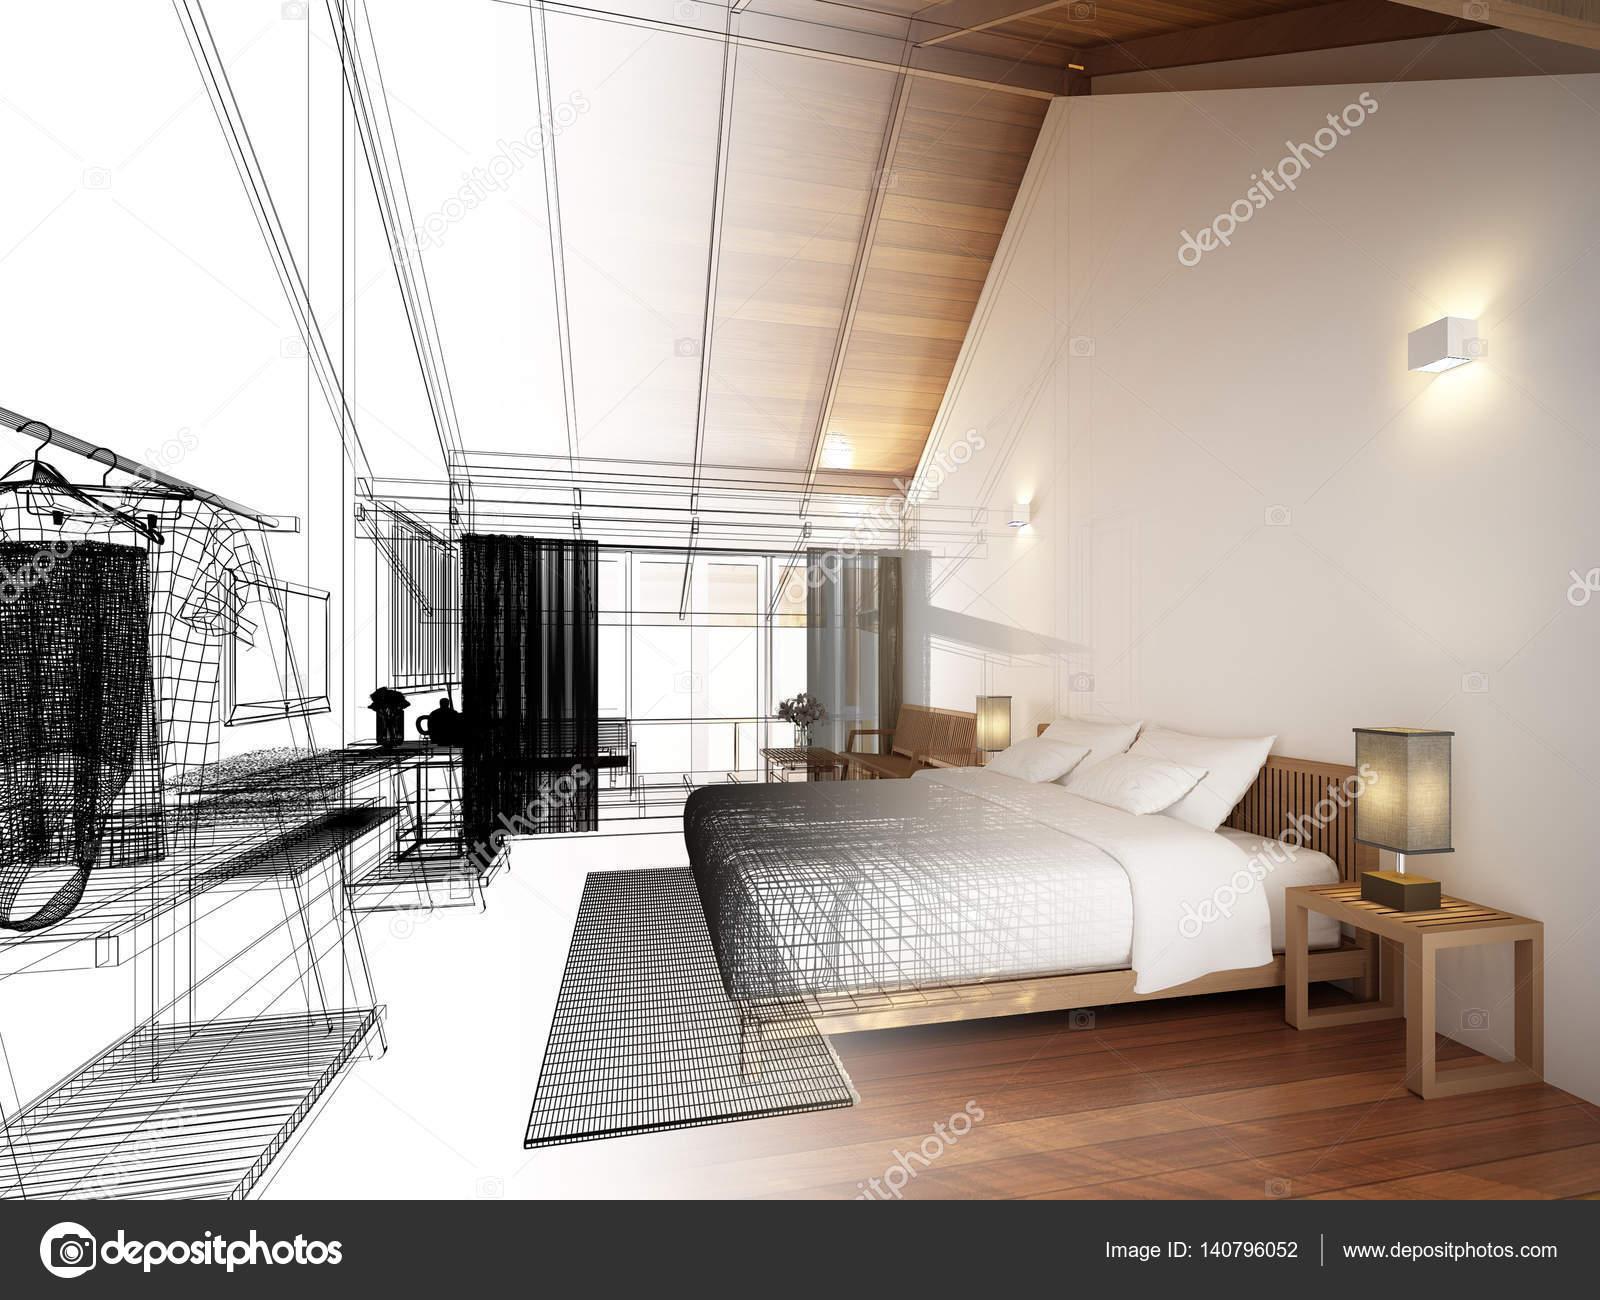 abstract sketch design of interior bedroom stock photo yaryhee rh depositphotos com